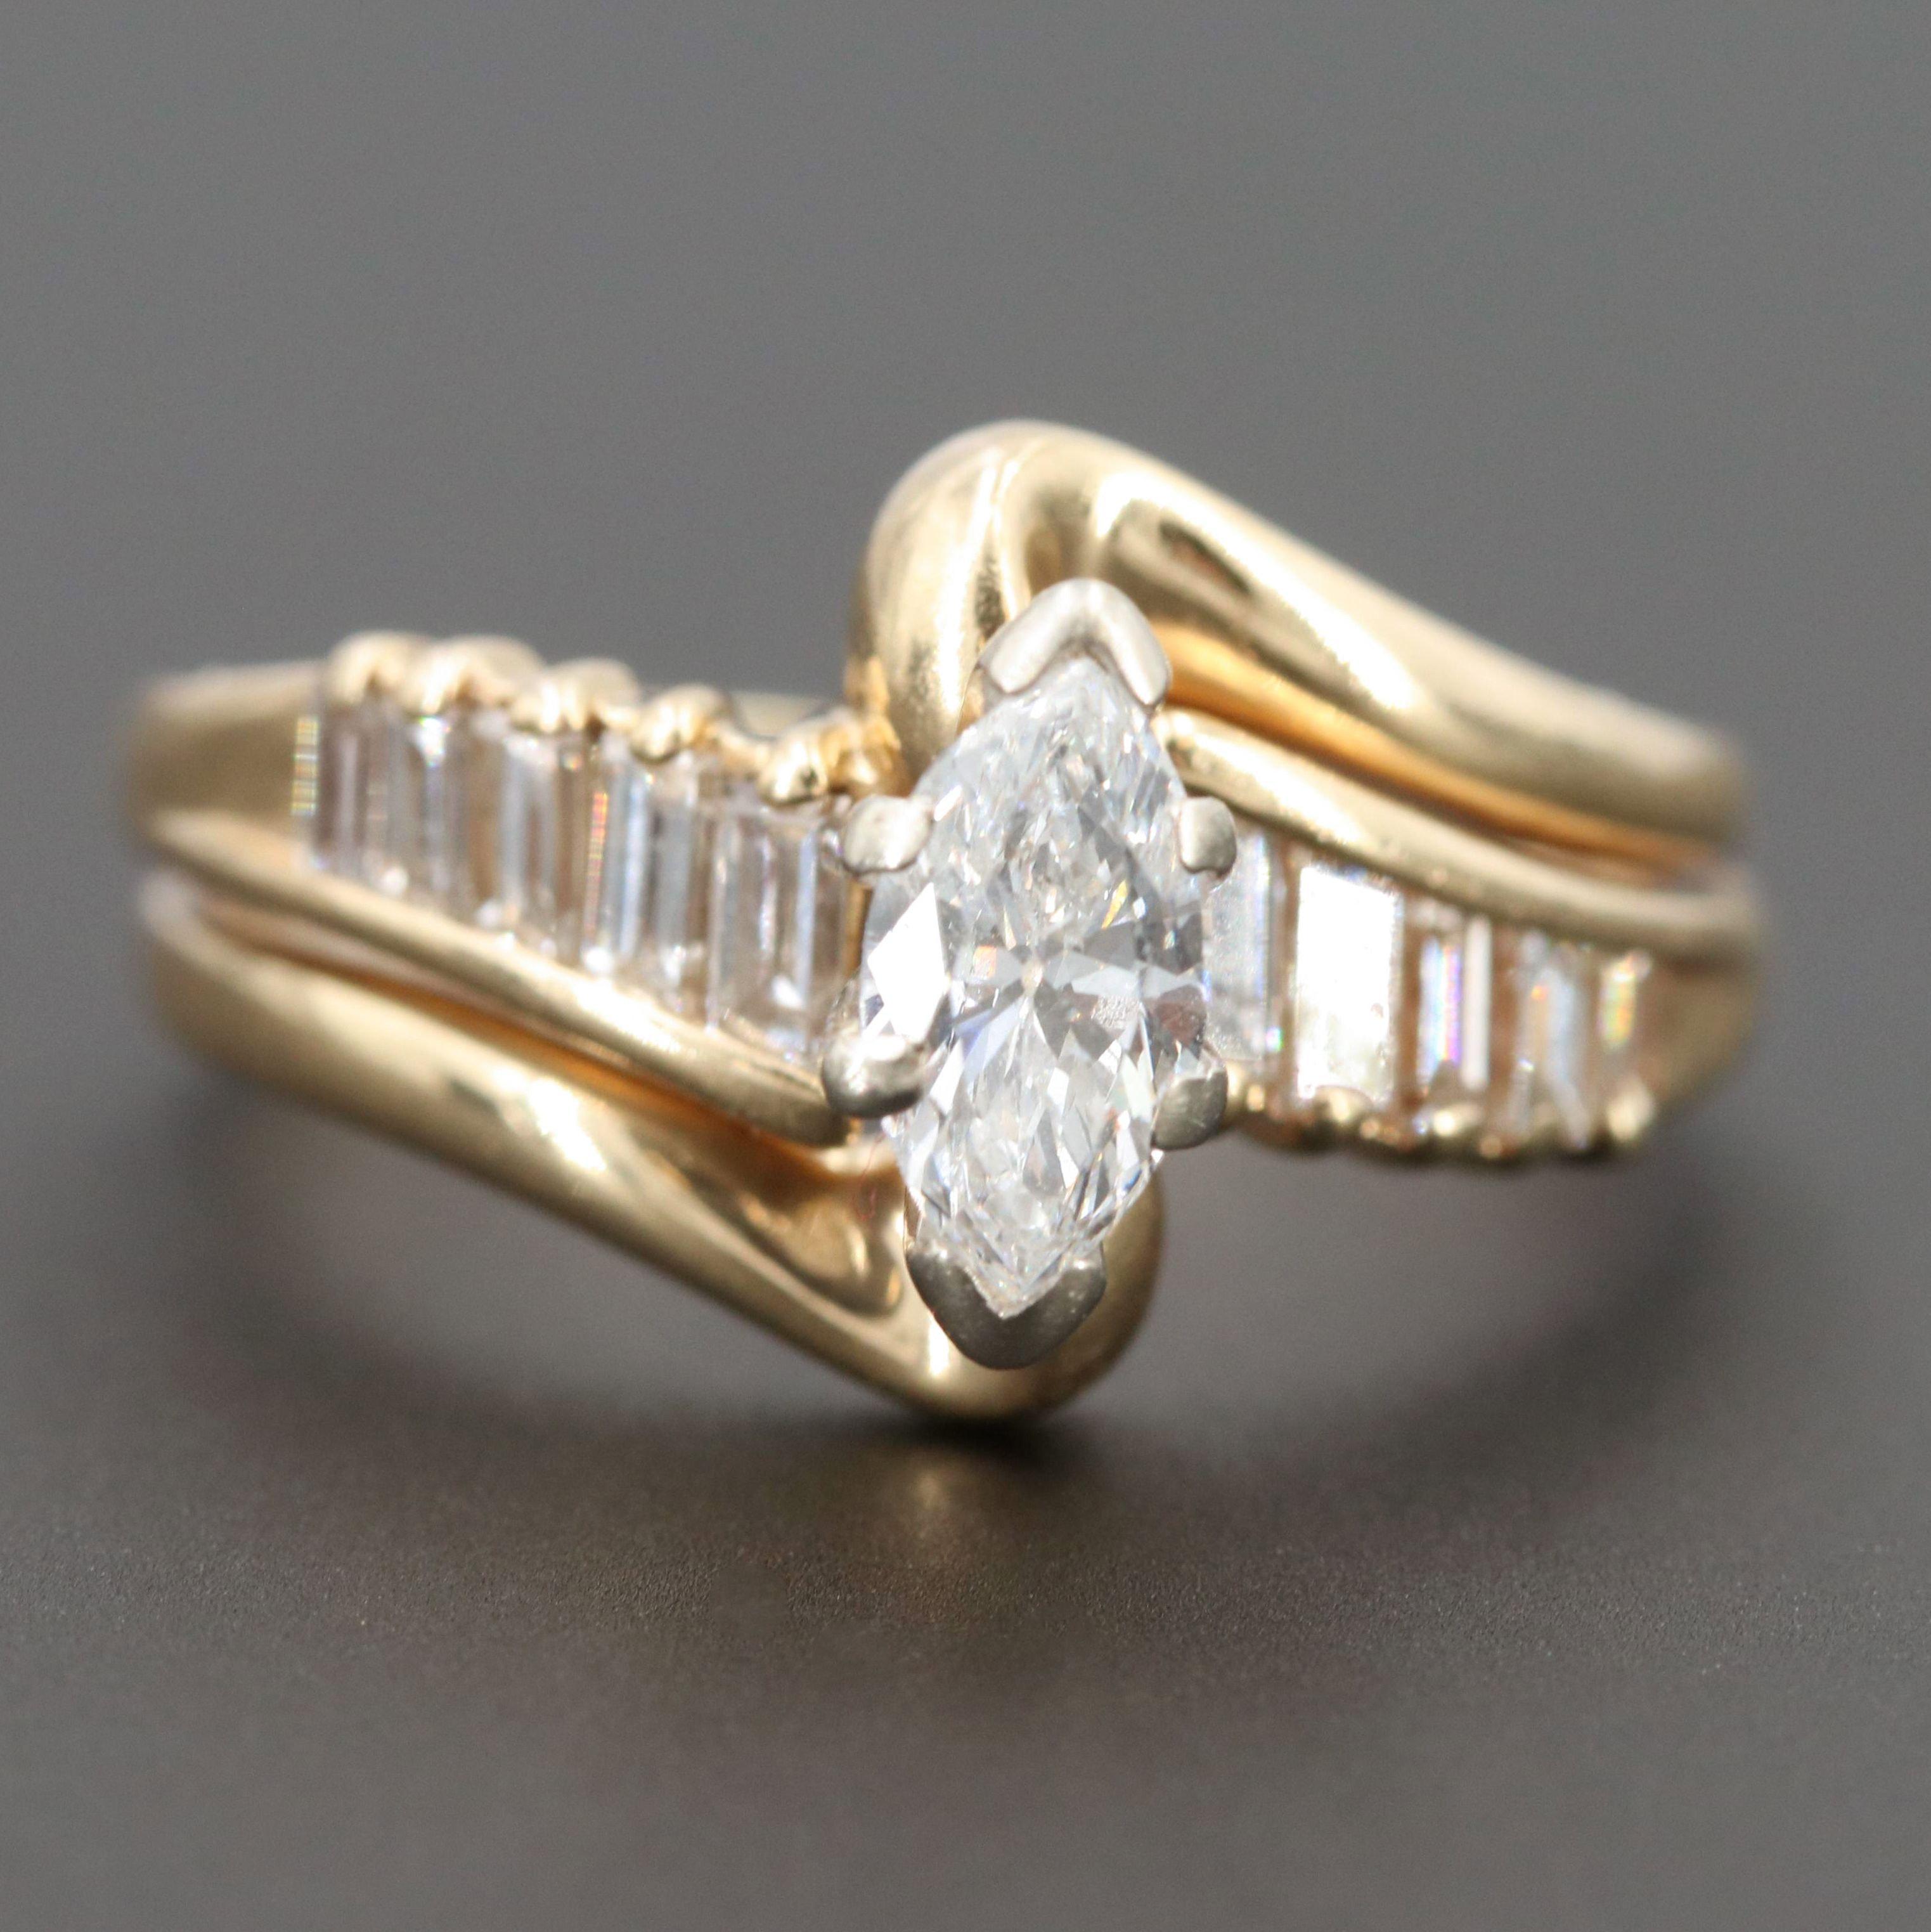 14K Yellow Gold Diamond Soldered Ring